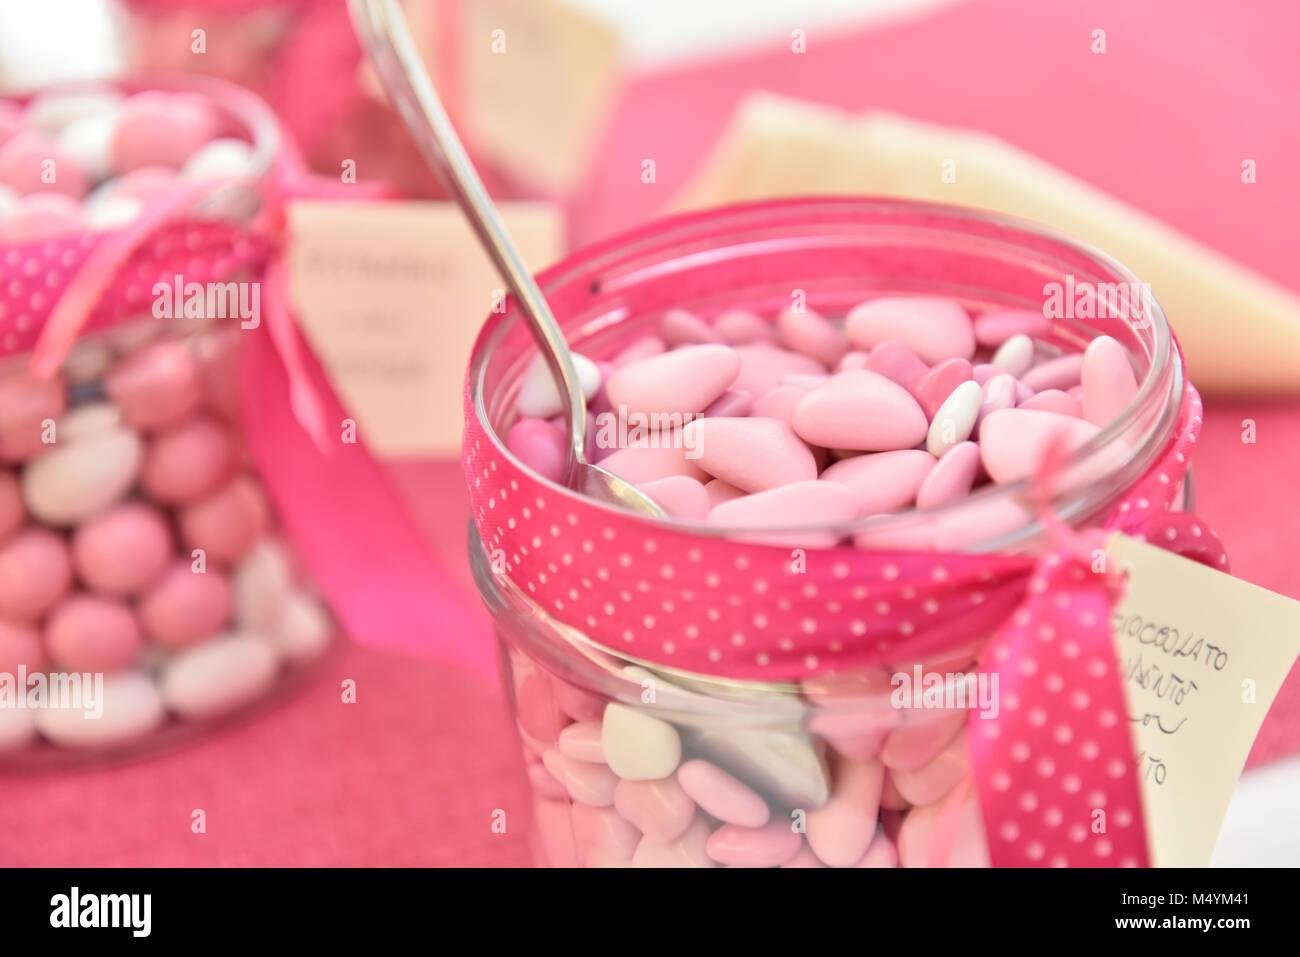 Baby Food Jars Stock Photos & Baby Food Jars Stock Images - Alamy